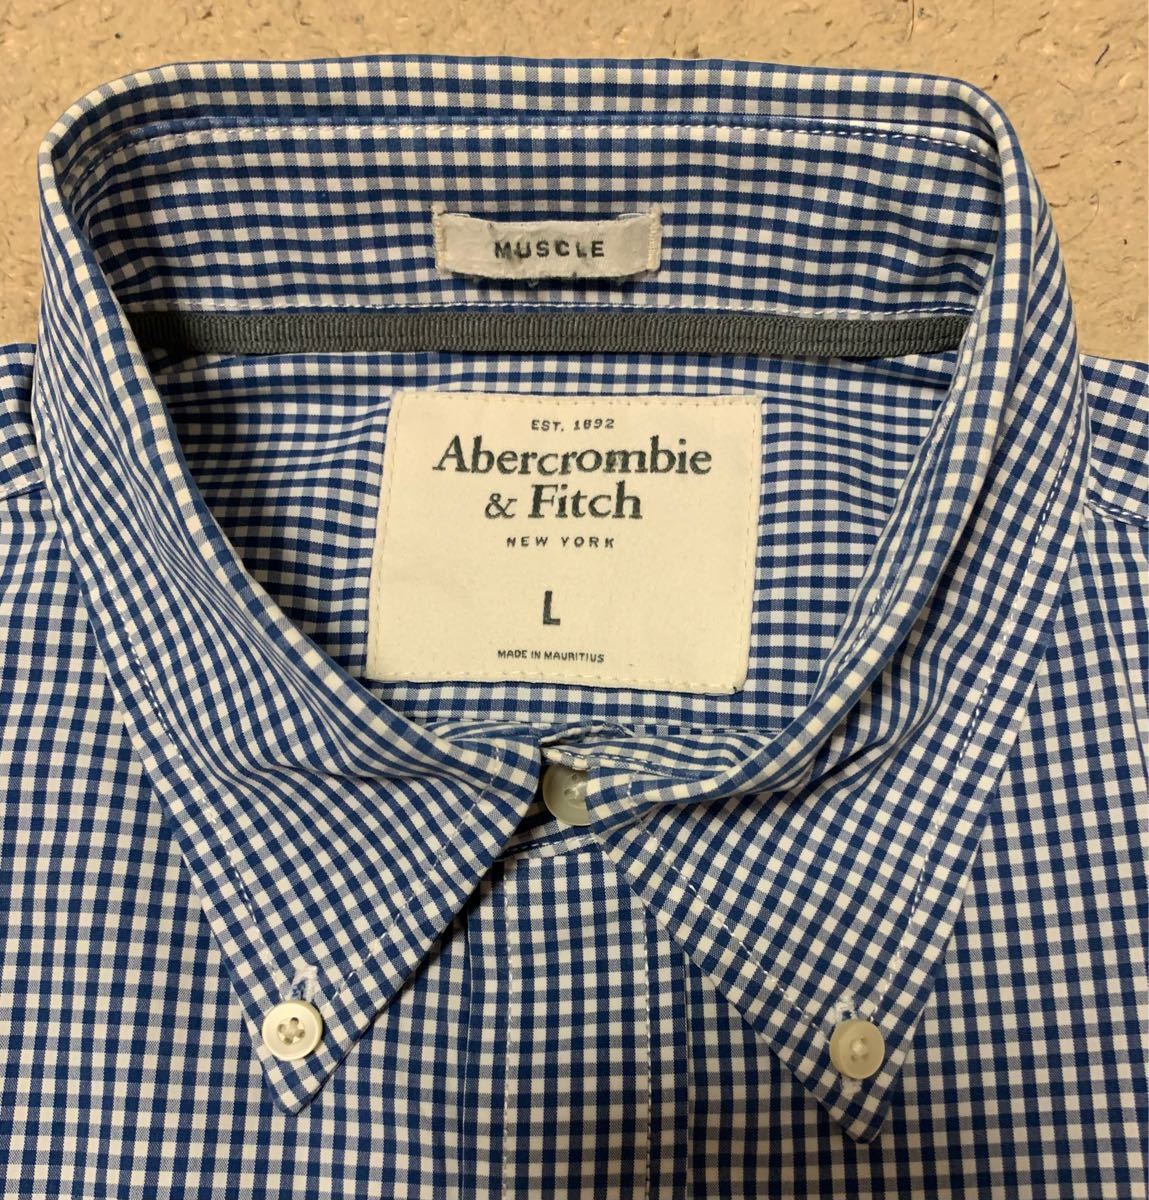 【Abercrombie&Fitch】アバクロンビー&フィッチ ストライプシャツ